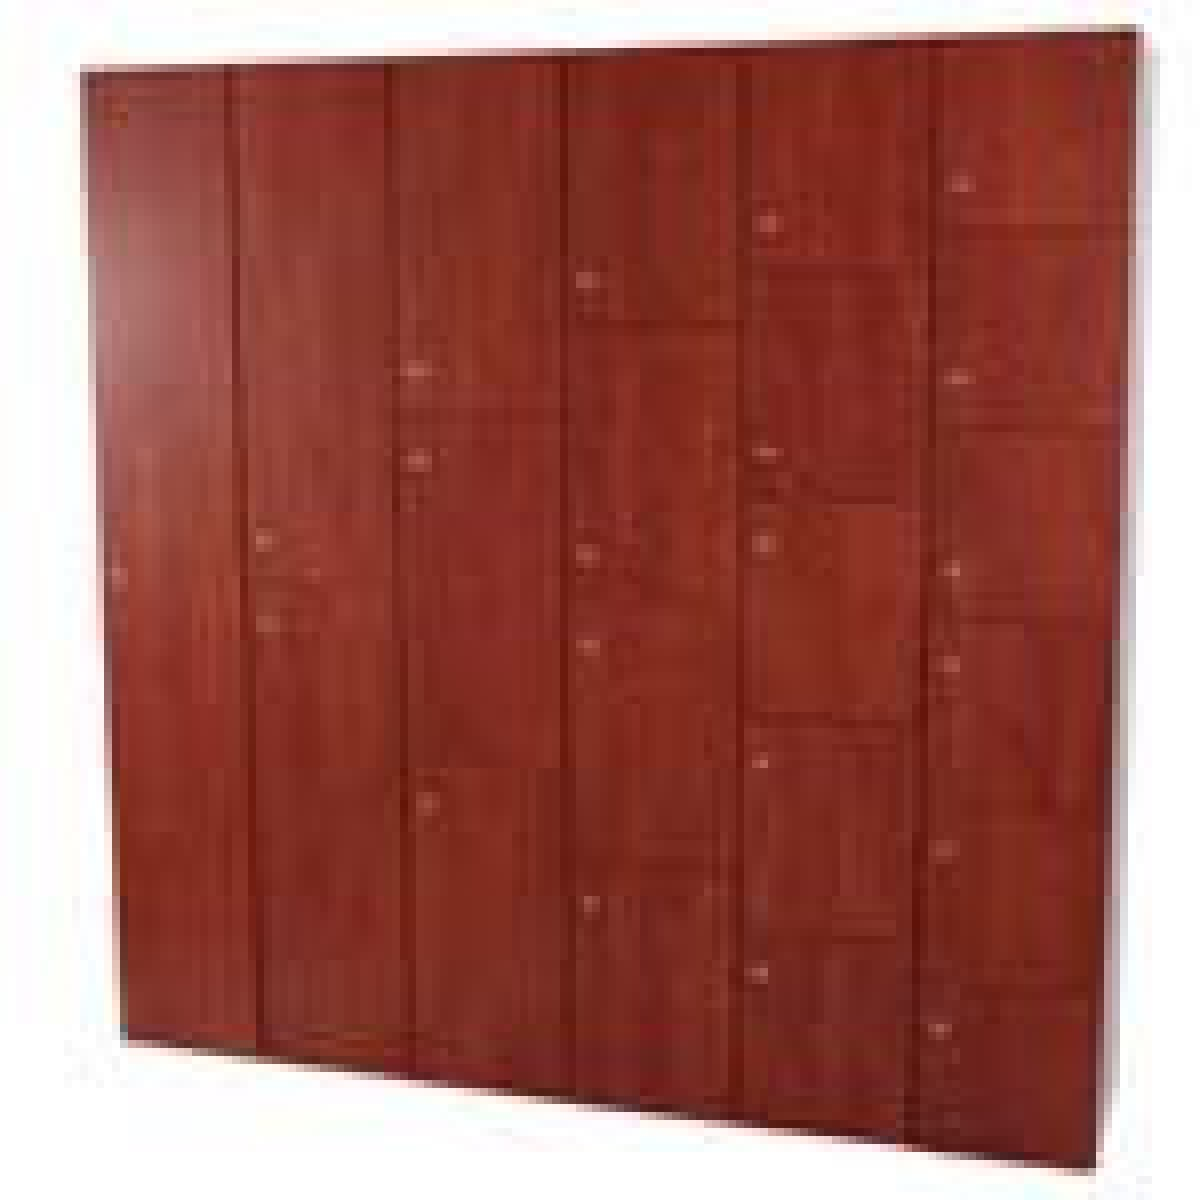 3x6 Metal Lockers Single Wood Locker Executive Lockers Wood Finish ...